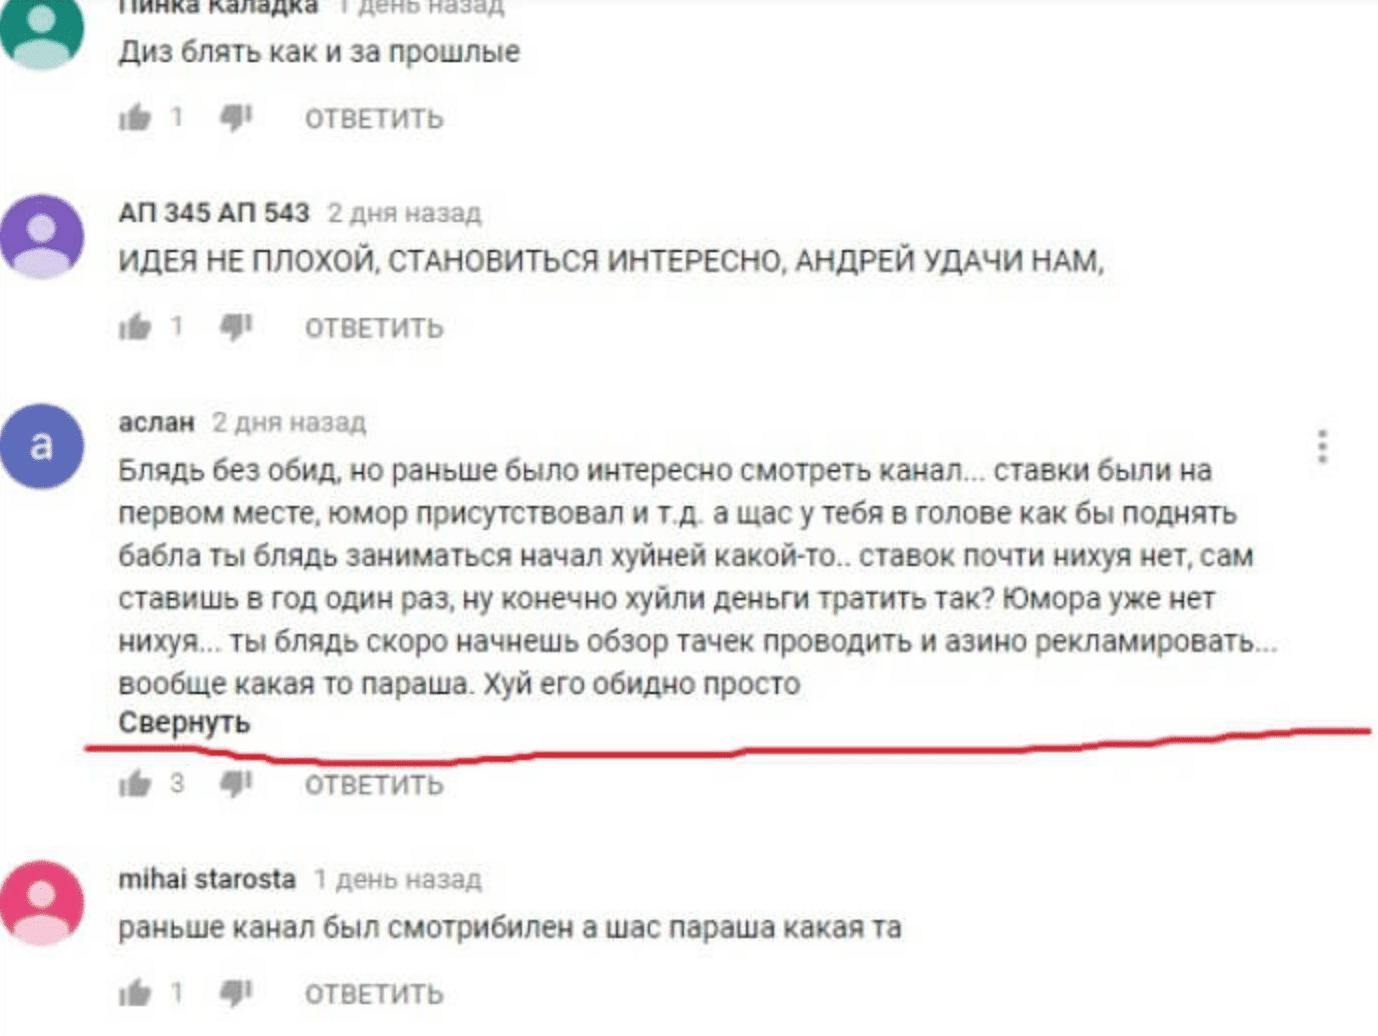 Отзывы о телеграм канале Андрея Алистарова Железная ставка (Железнаяставка)